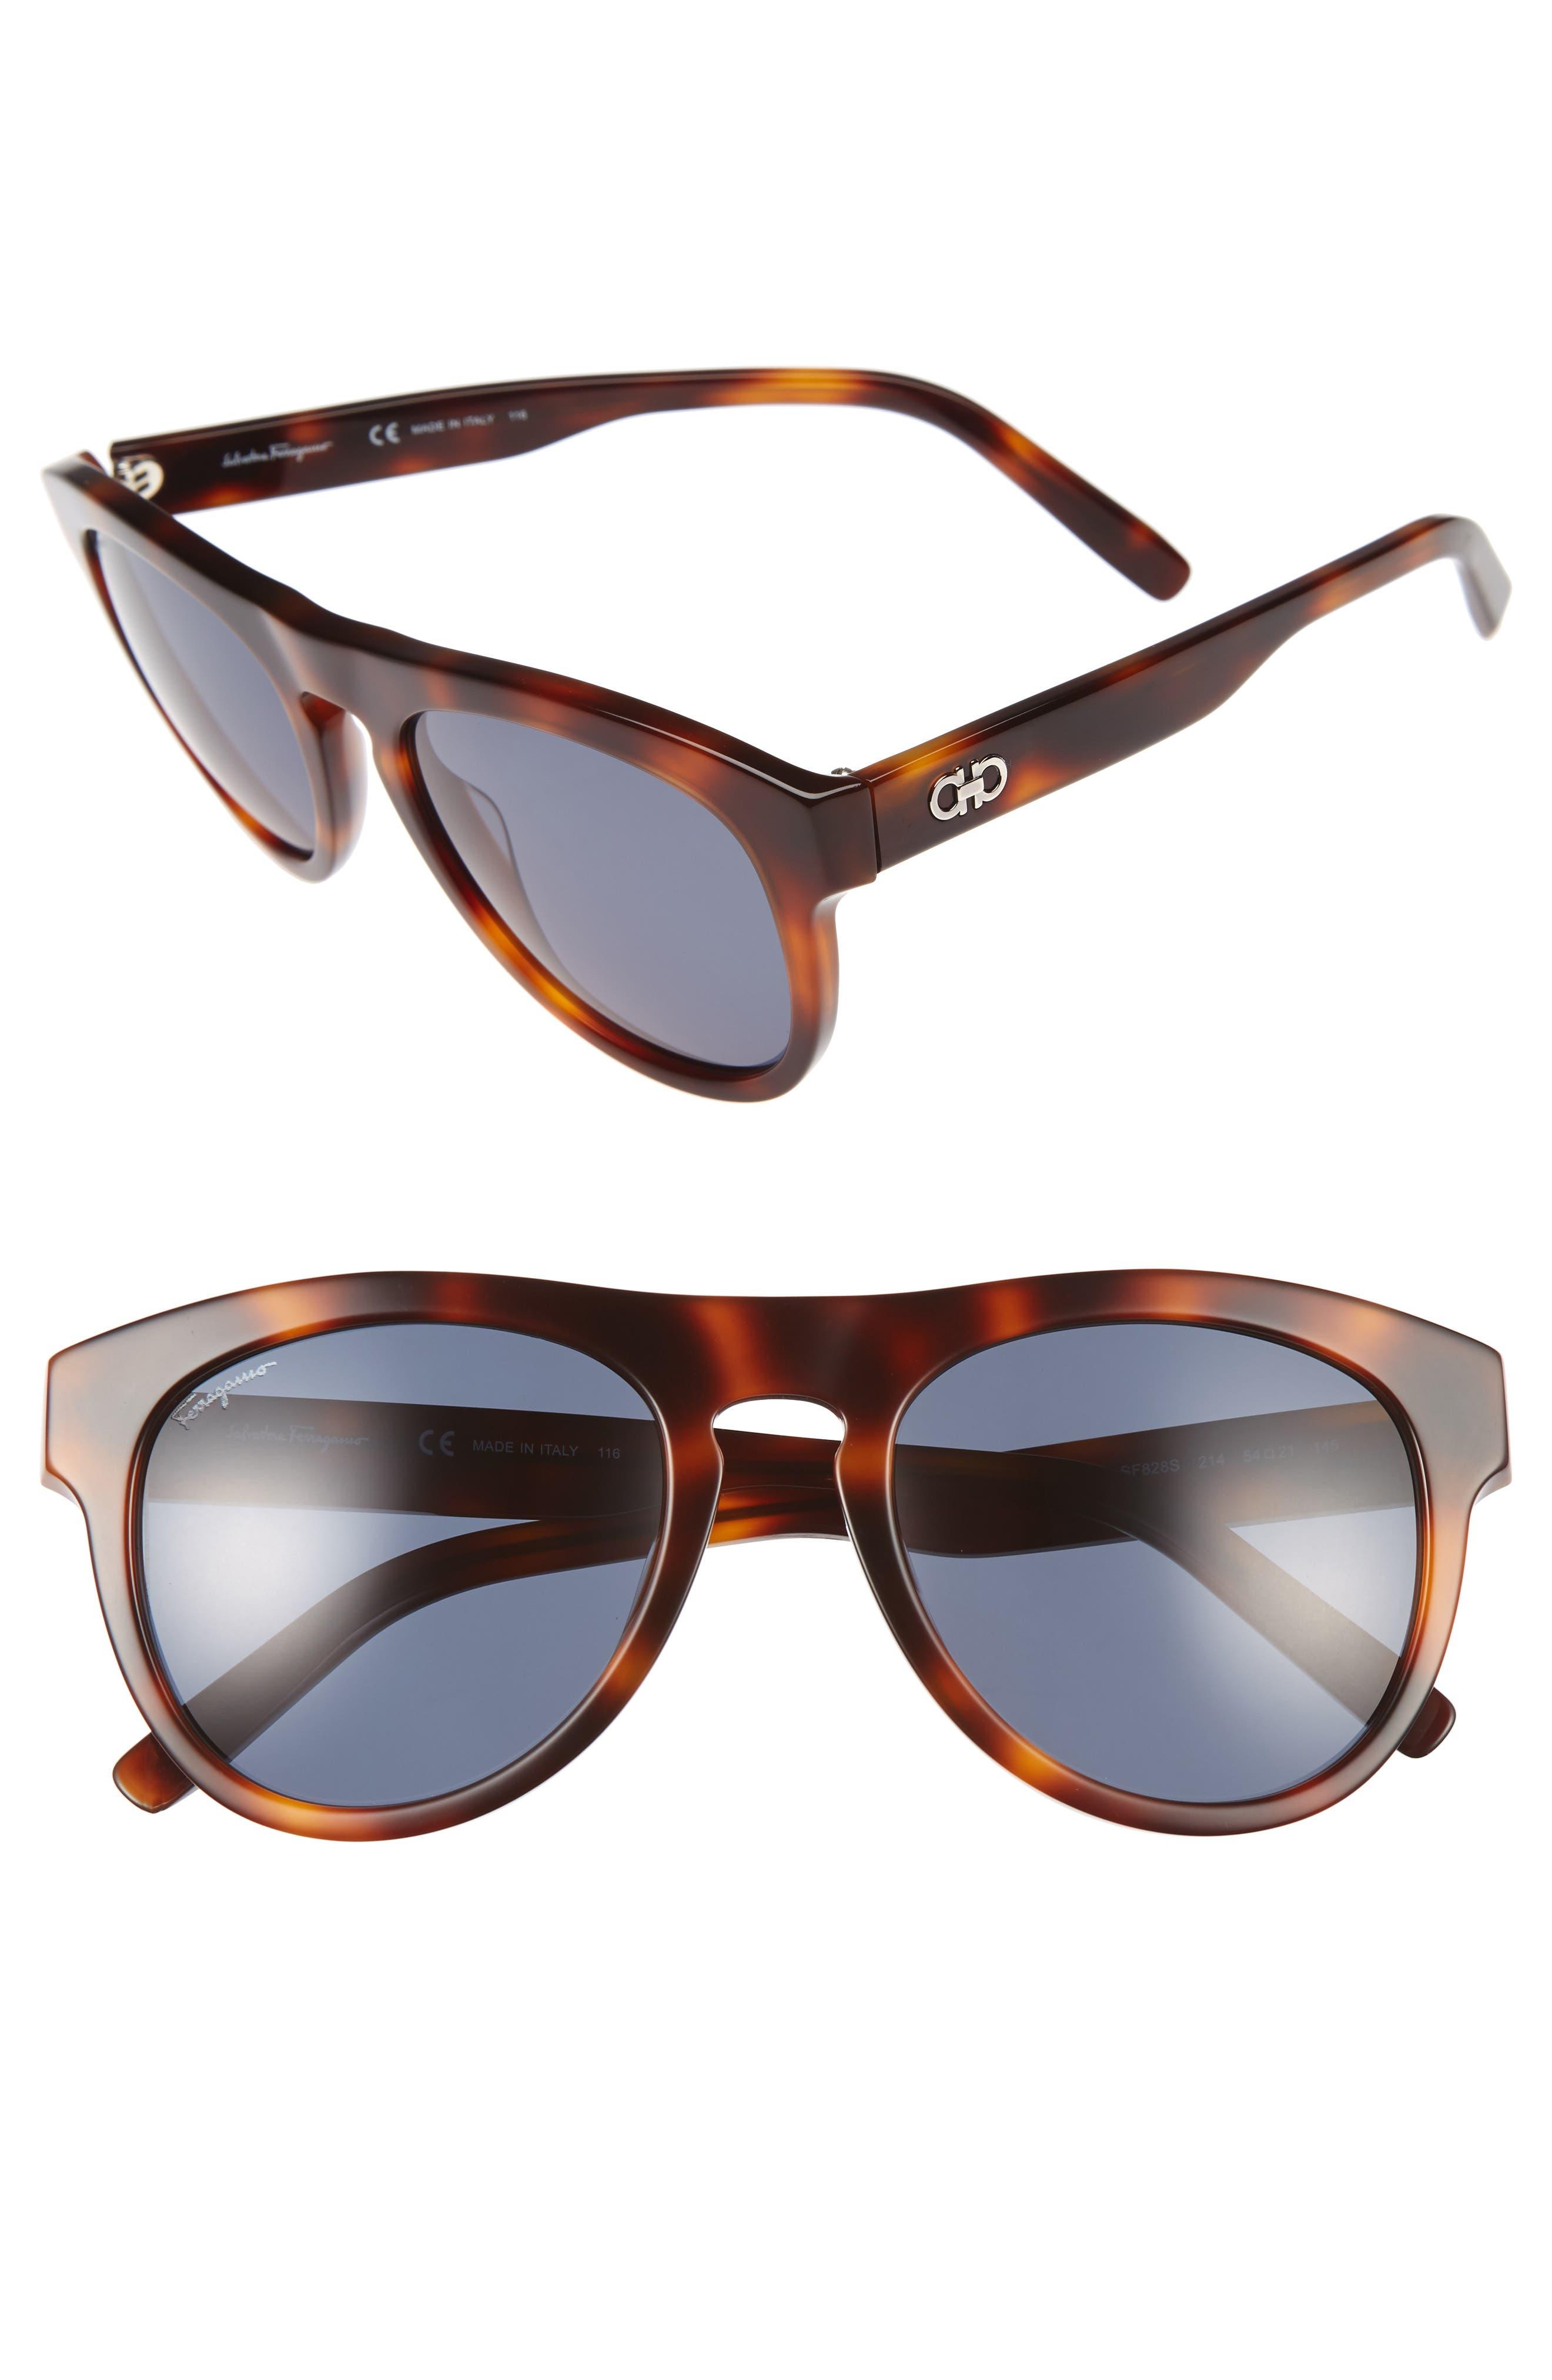 SALVATORE FERRAGAMO 54mm Sunglasses